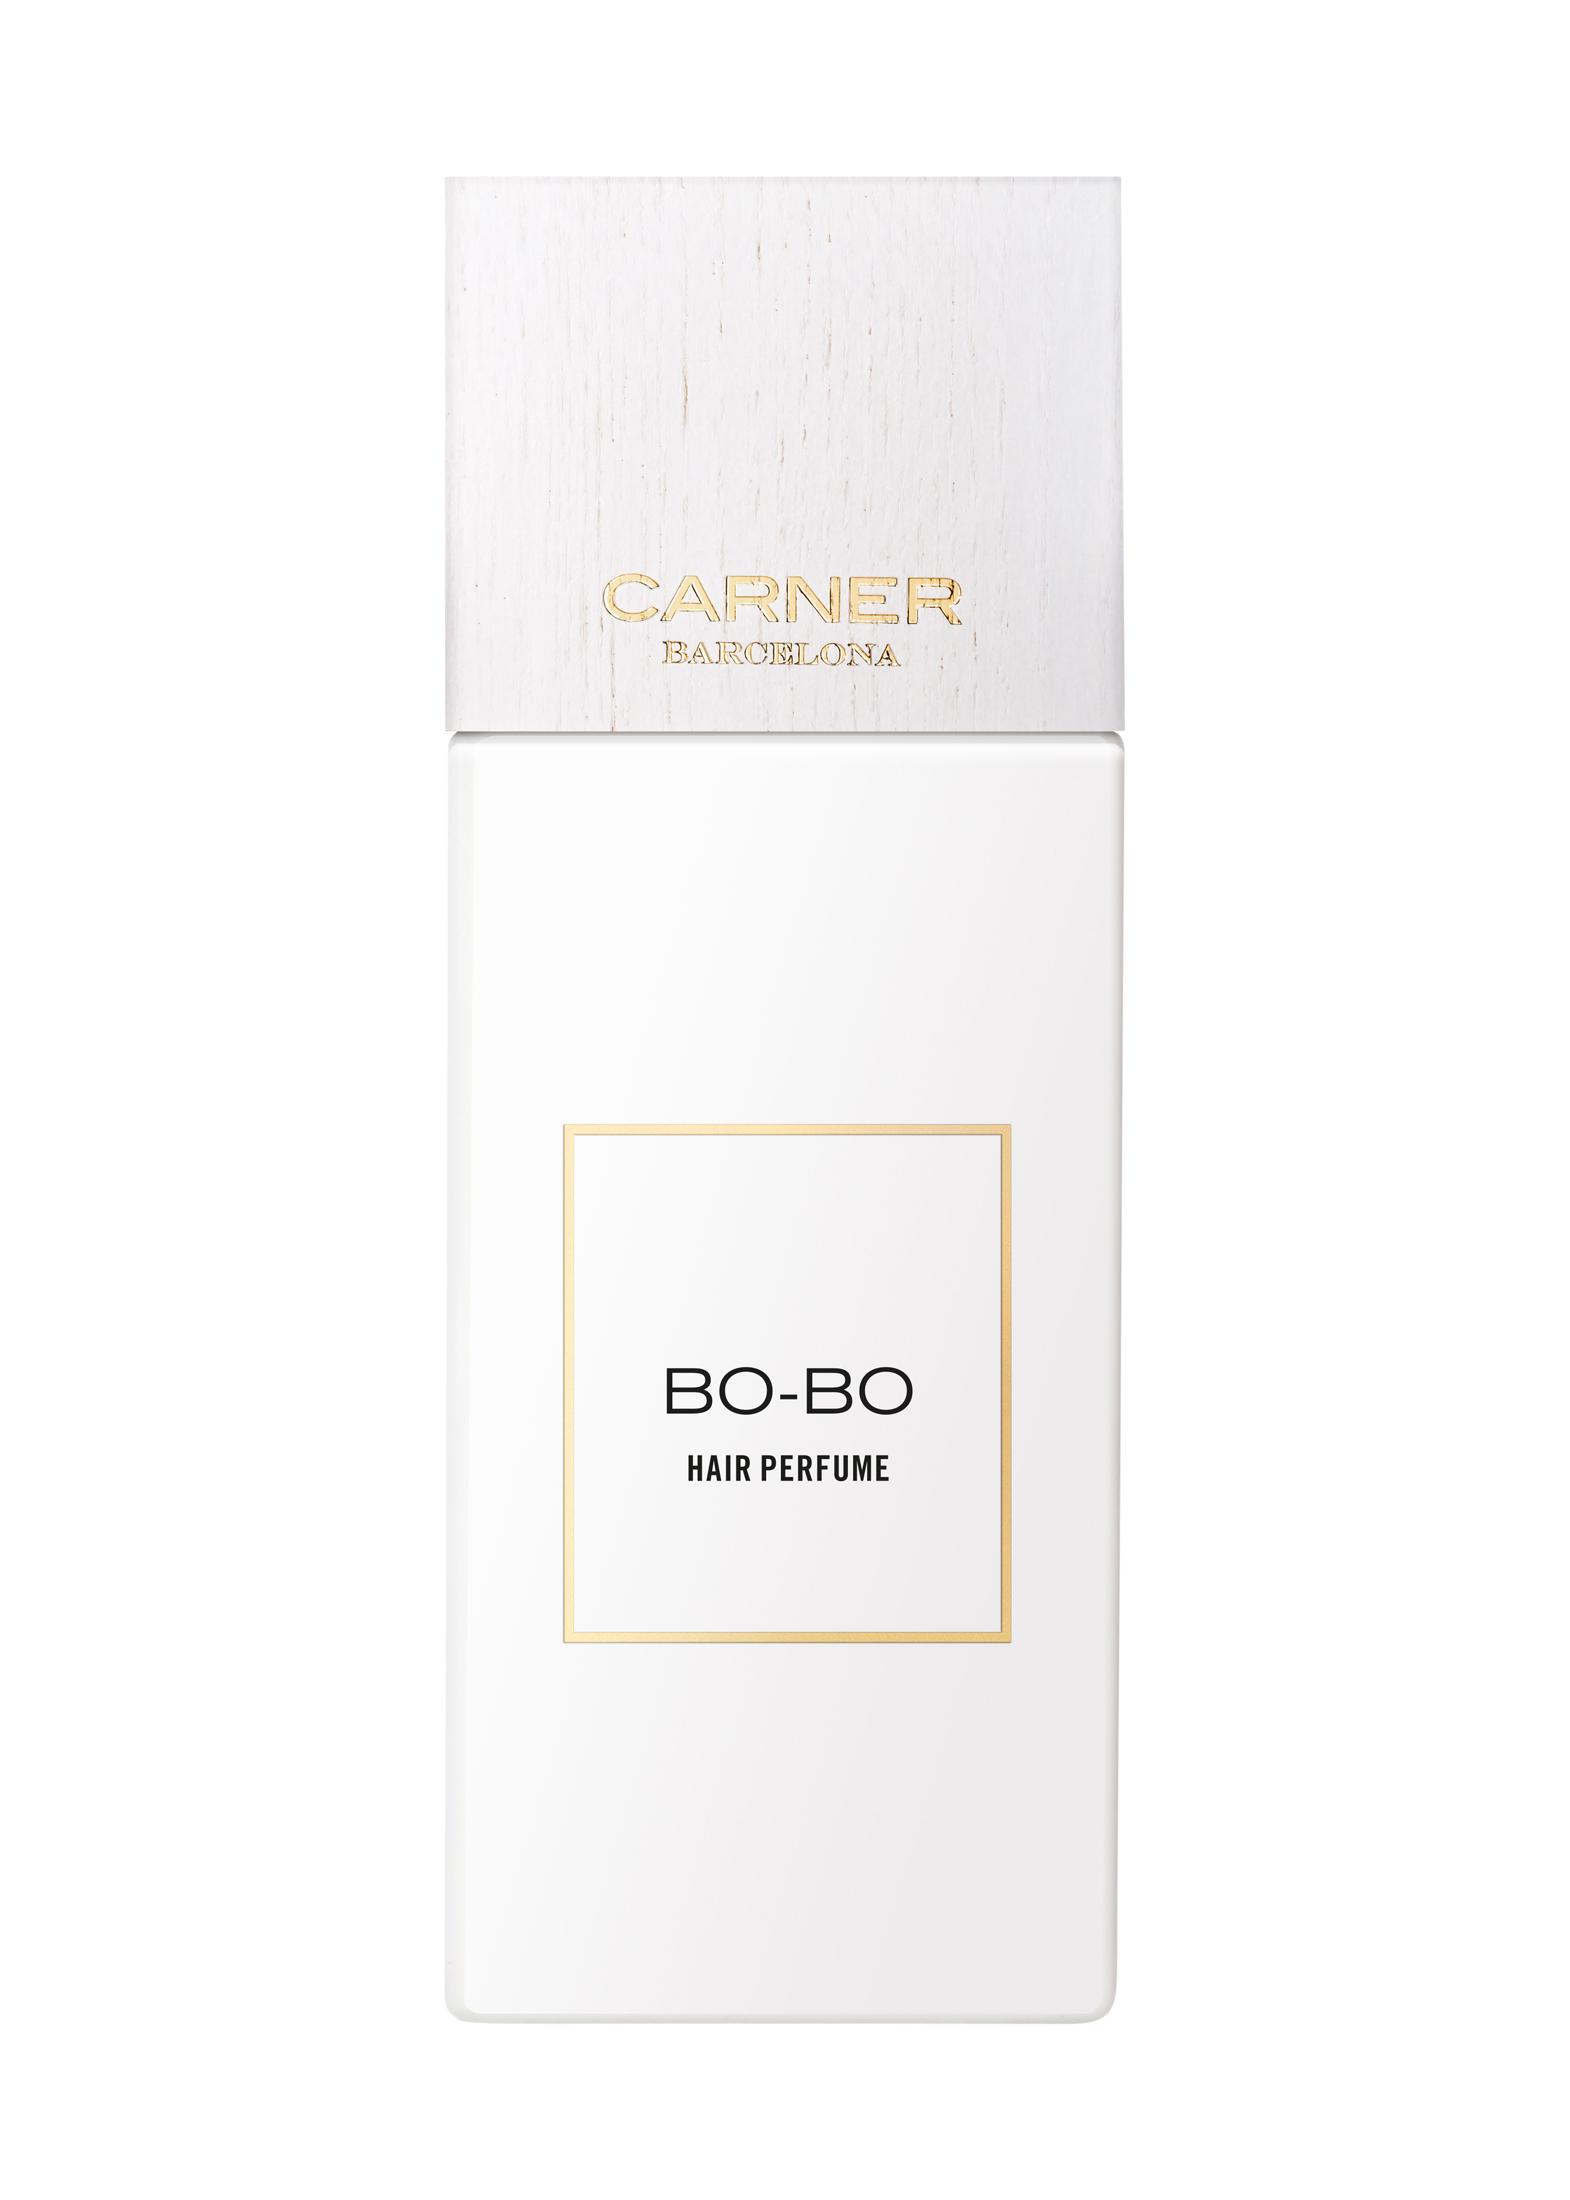 BO-BO HAIR PERFUME image number 0